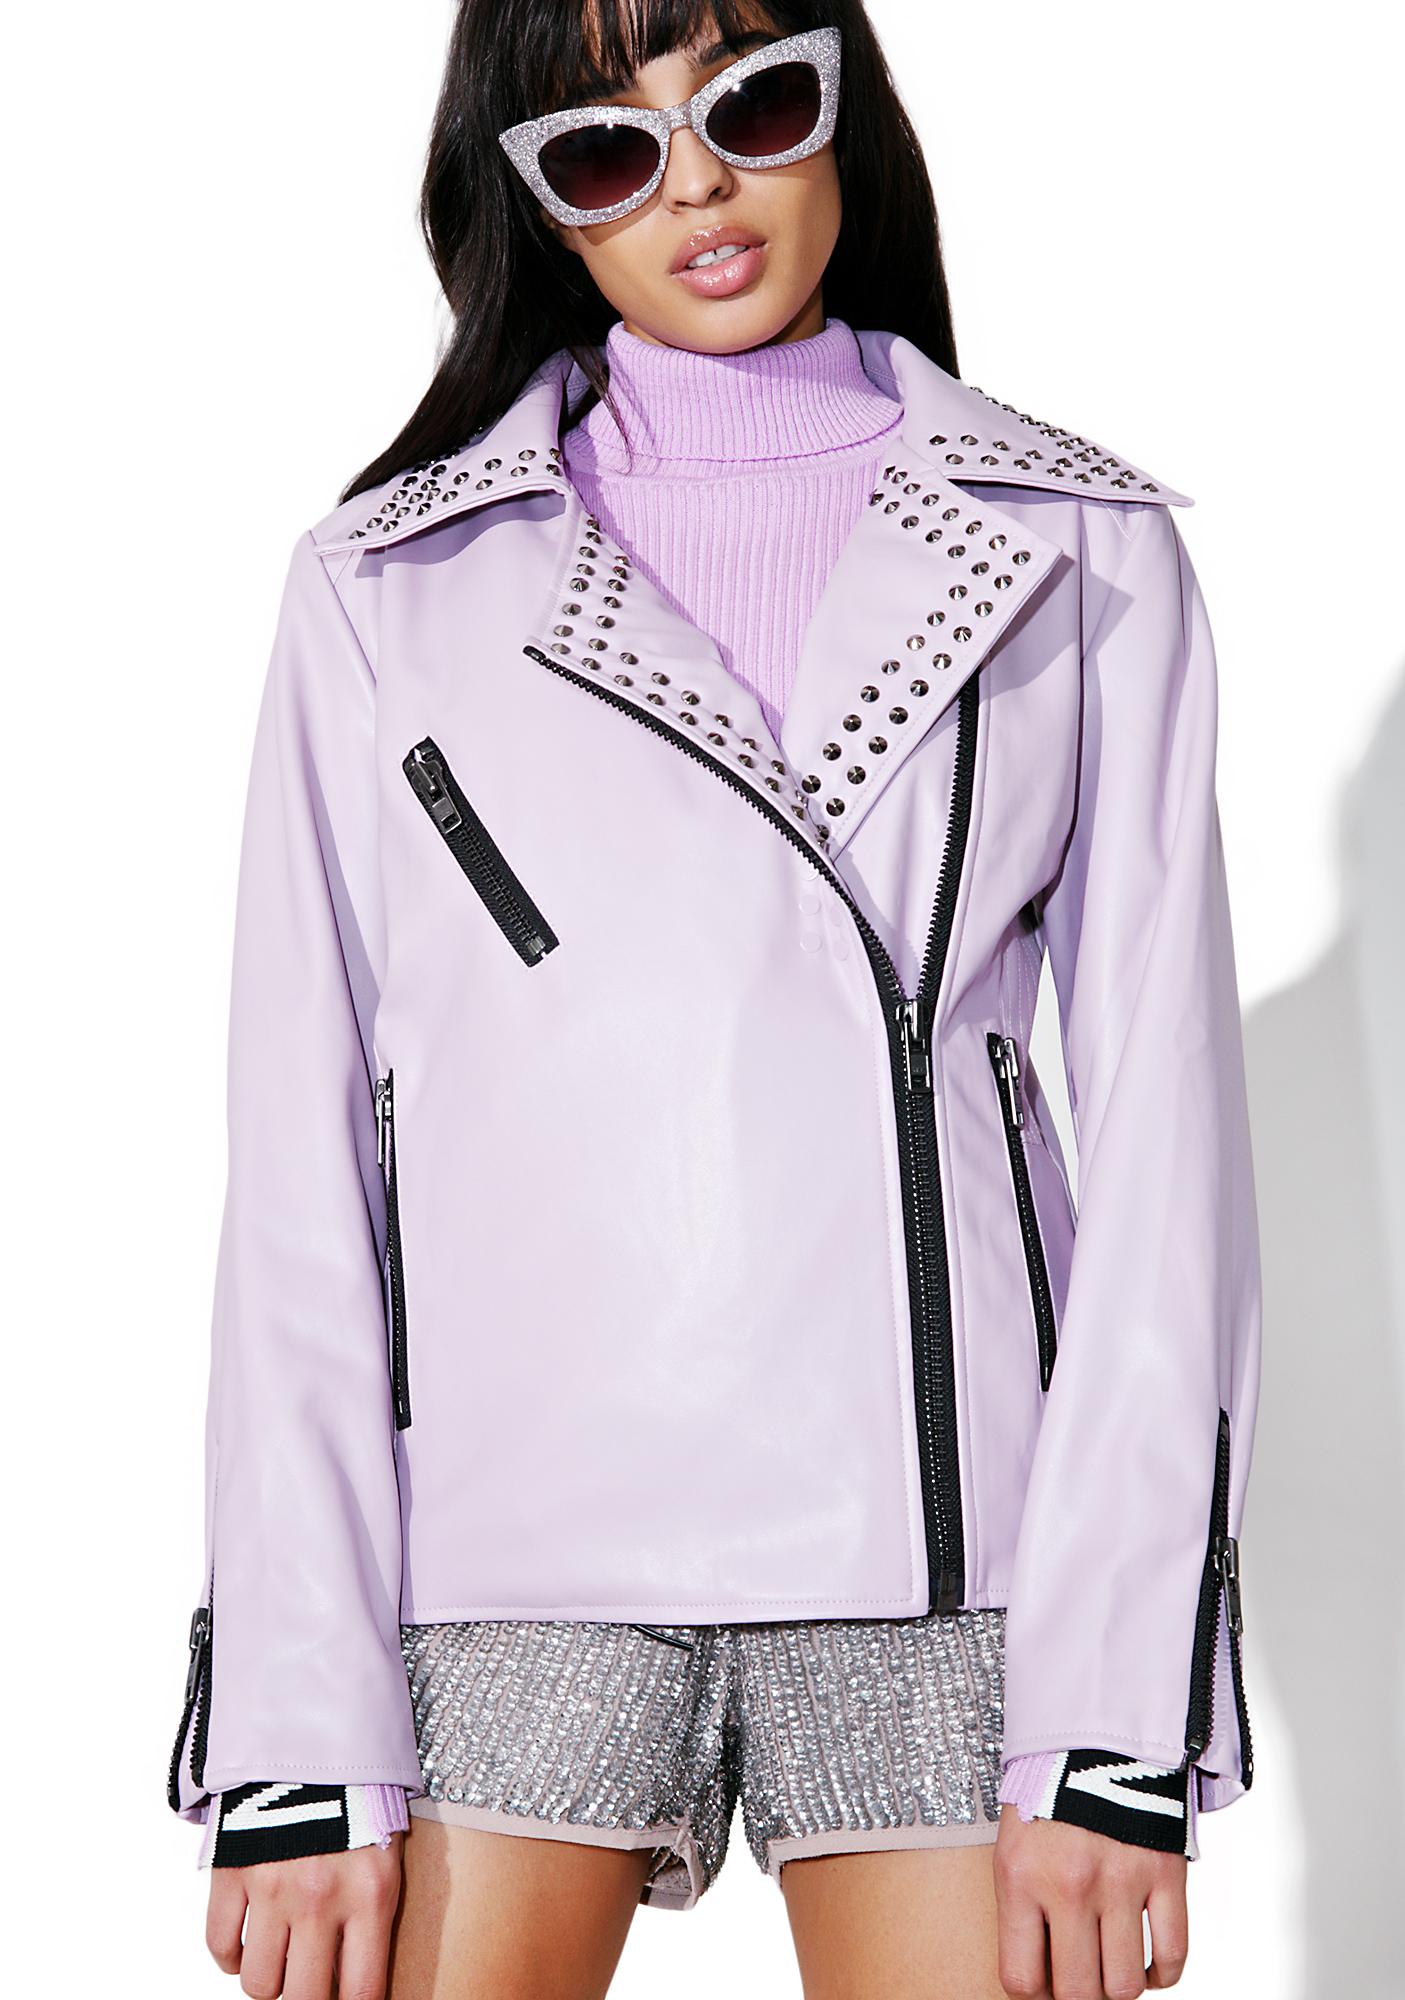 Nana Judy Dream On Leather Jacket